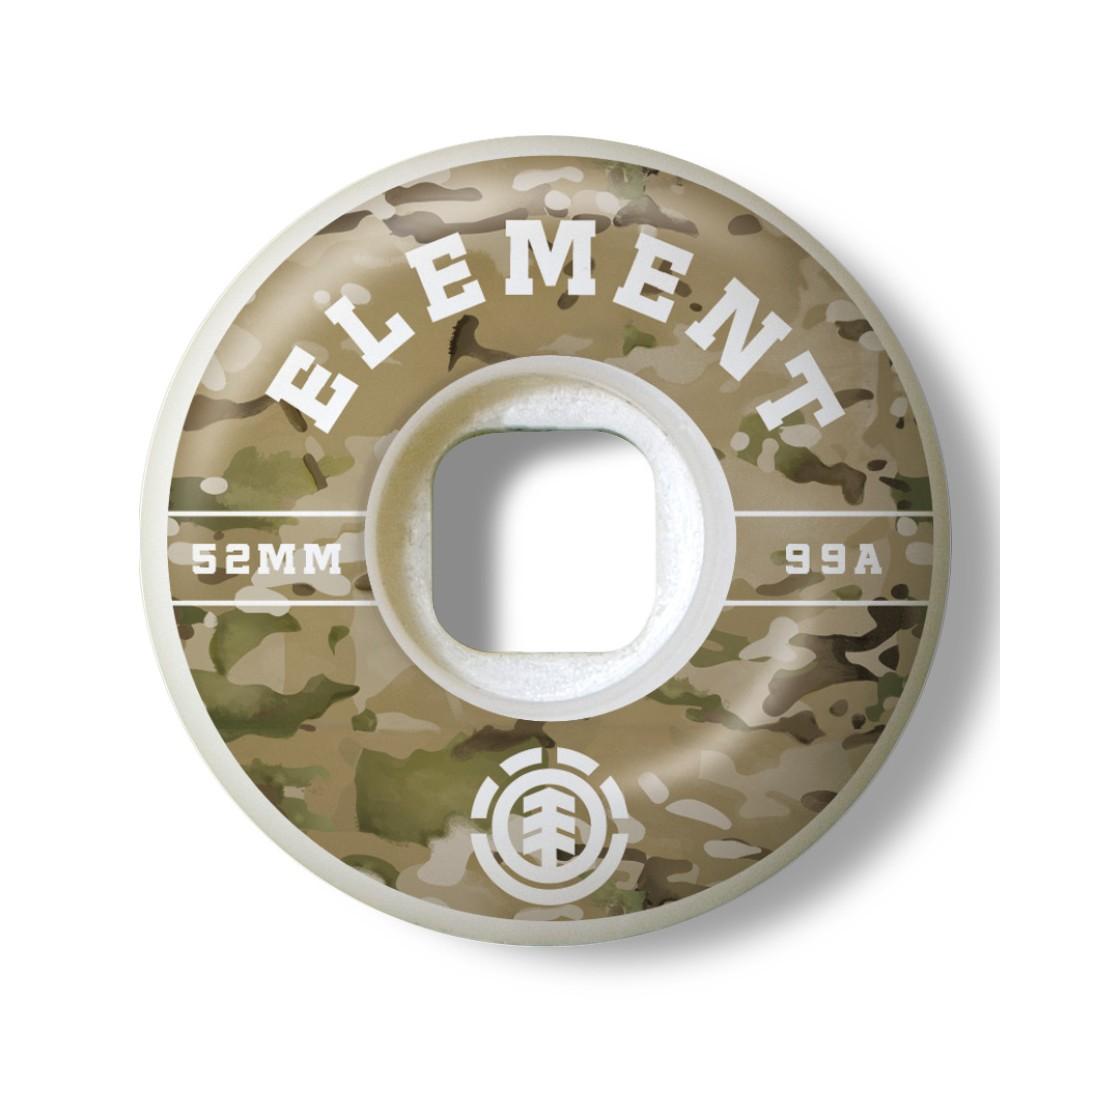 ROUES ELEMENT camo griffin 52mm